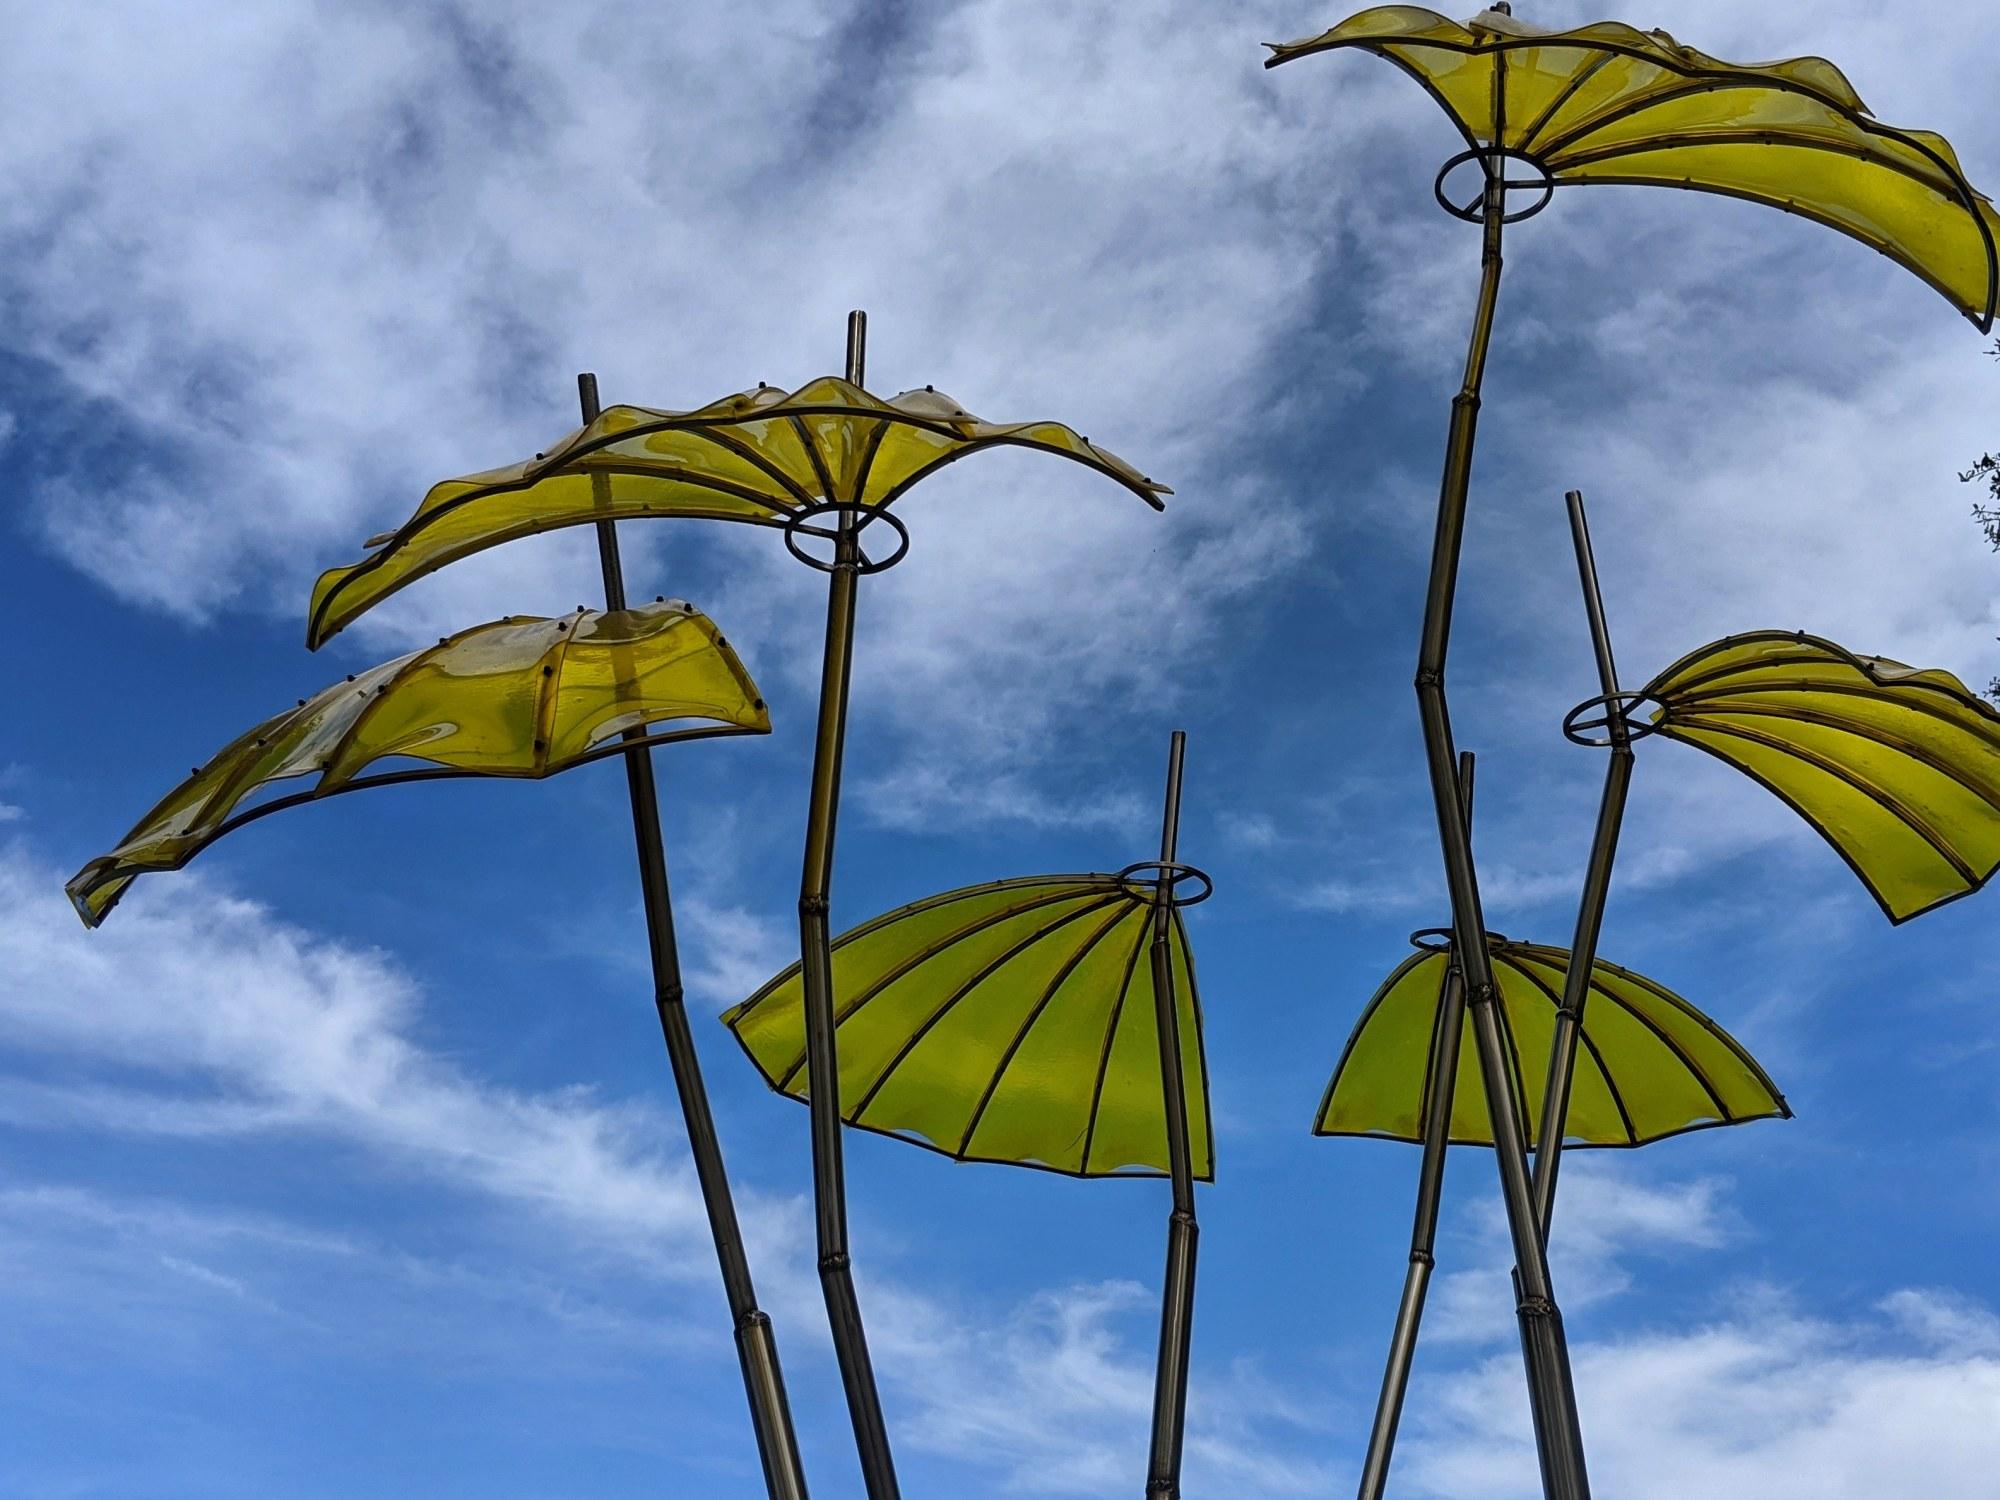 Sculpture against blue sky a photo by LensMoments - Nichole Spates 2020